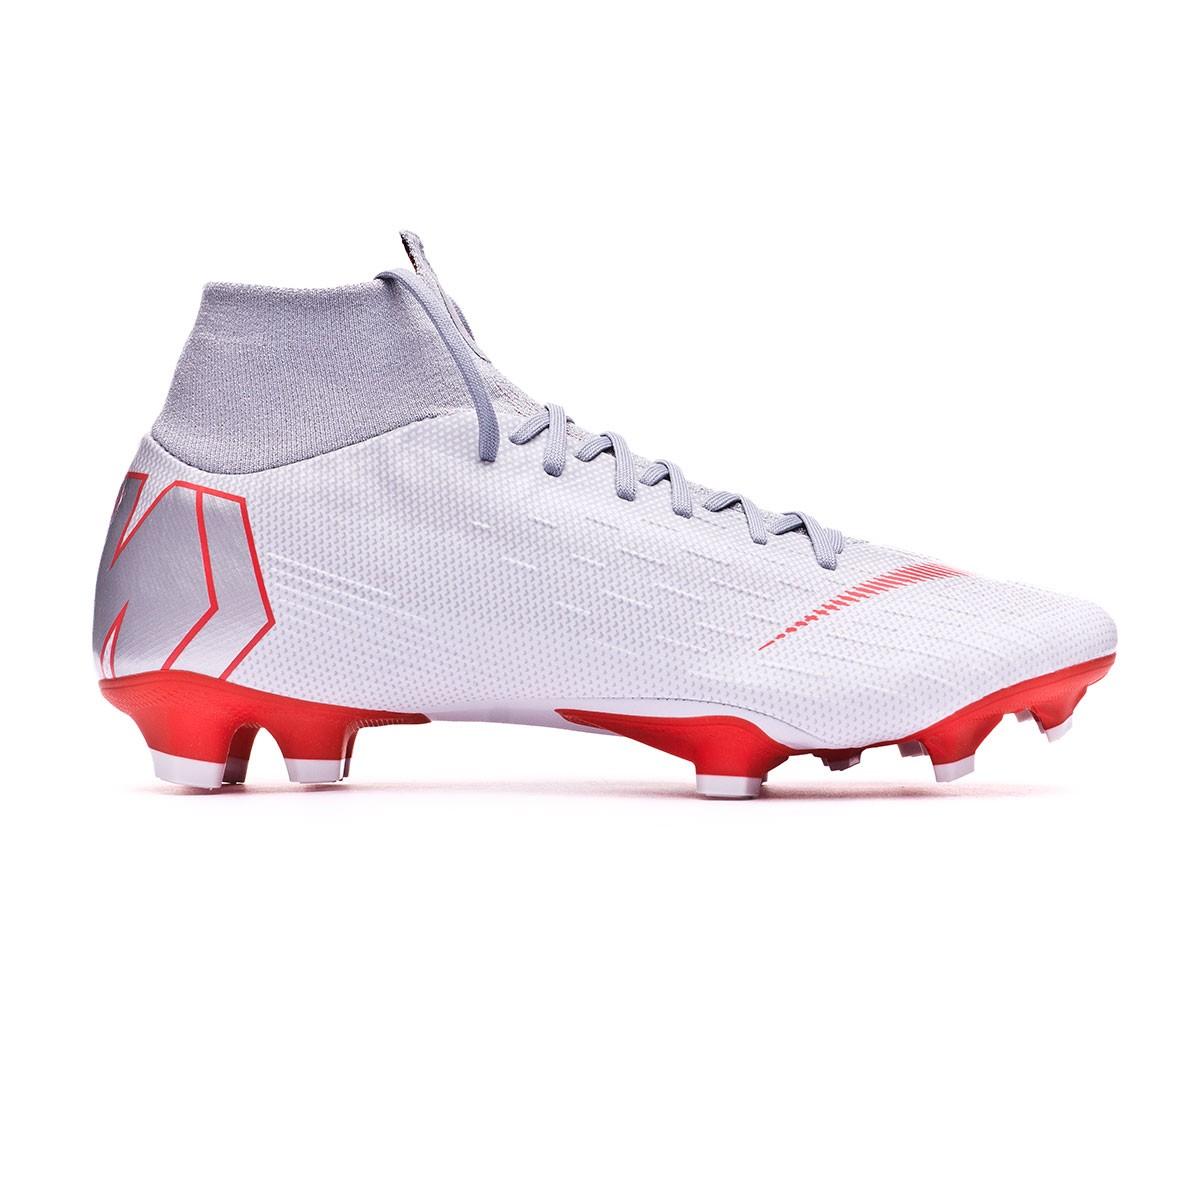 f18b1eea4 Boot Nike Mercurial Superfly VI Pro FG Wolf grey-Light crimson-Pure  platinum - Leaked soccer